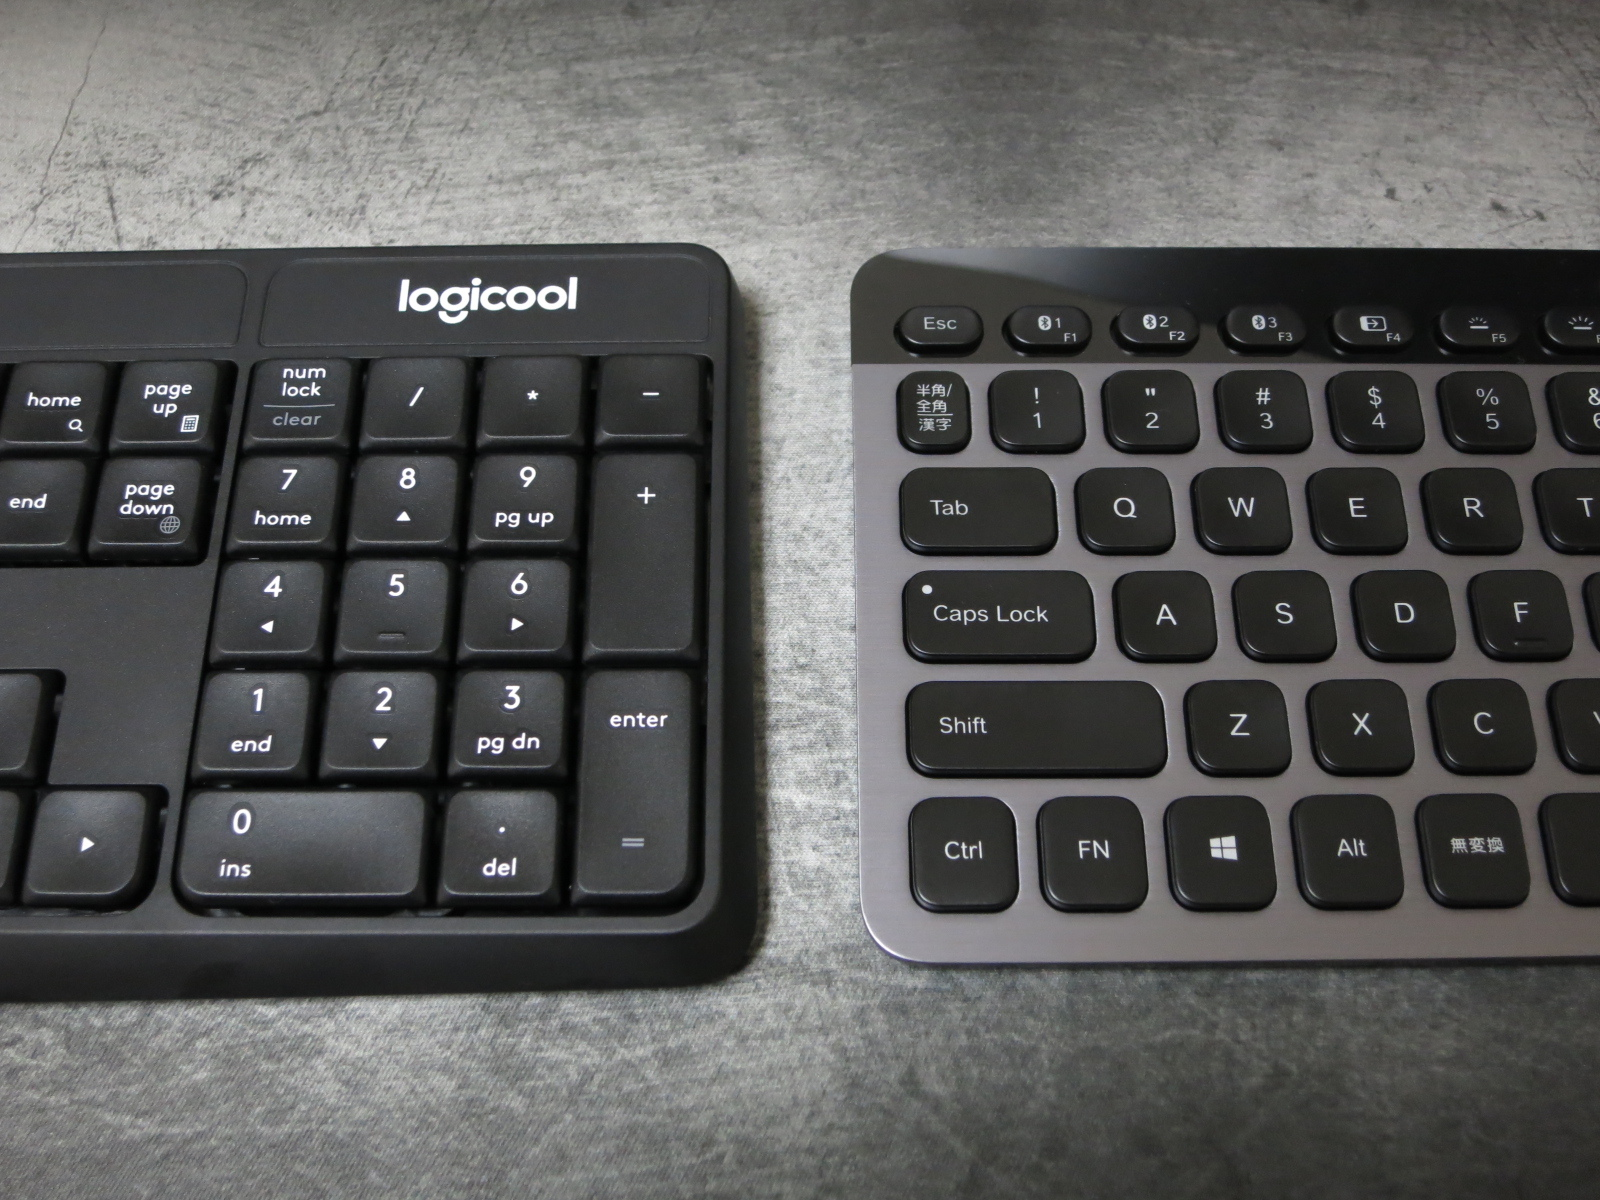 Logicool_K375s_32.jpg